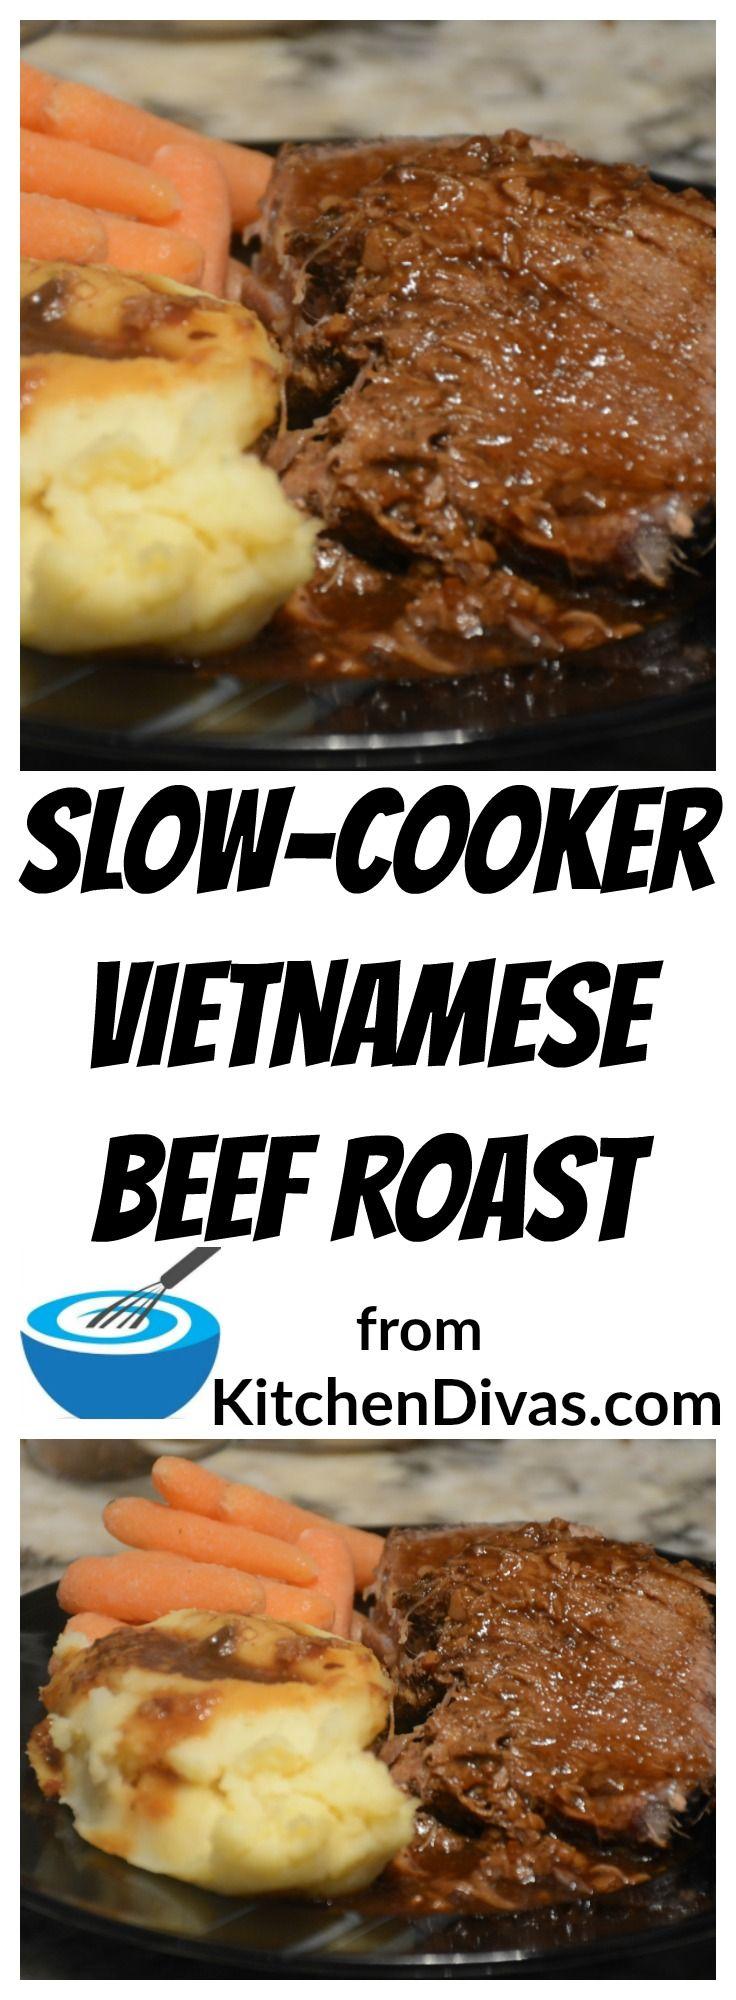 Slow-Cooker Vietnamese Beef Roast with teriyaki sauce